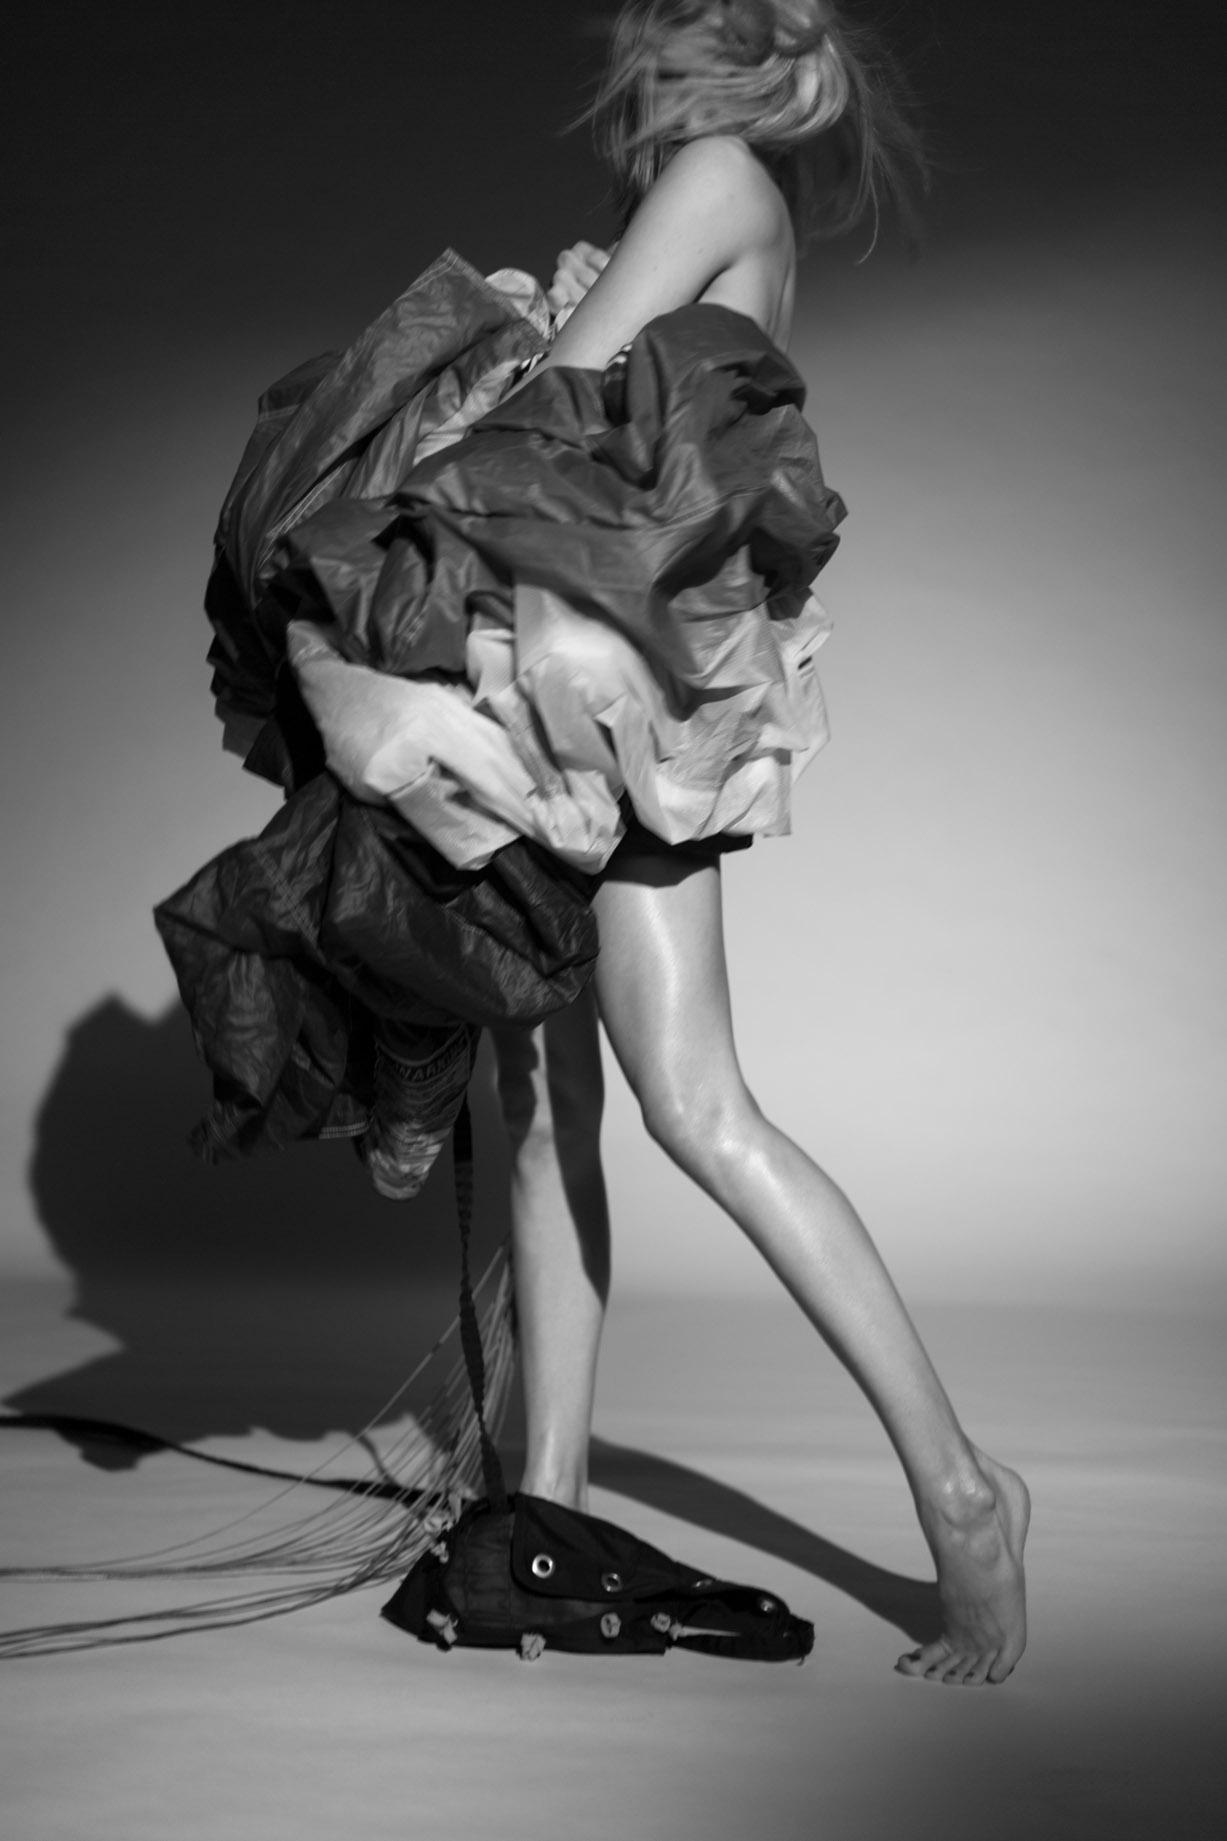 Обнаженная парашютистка / Icarus Woman by Marcin Biedron